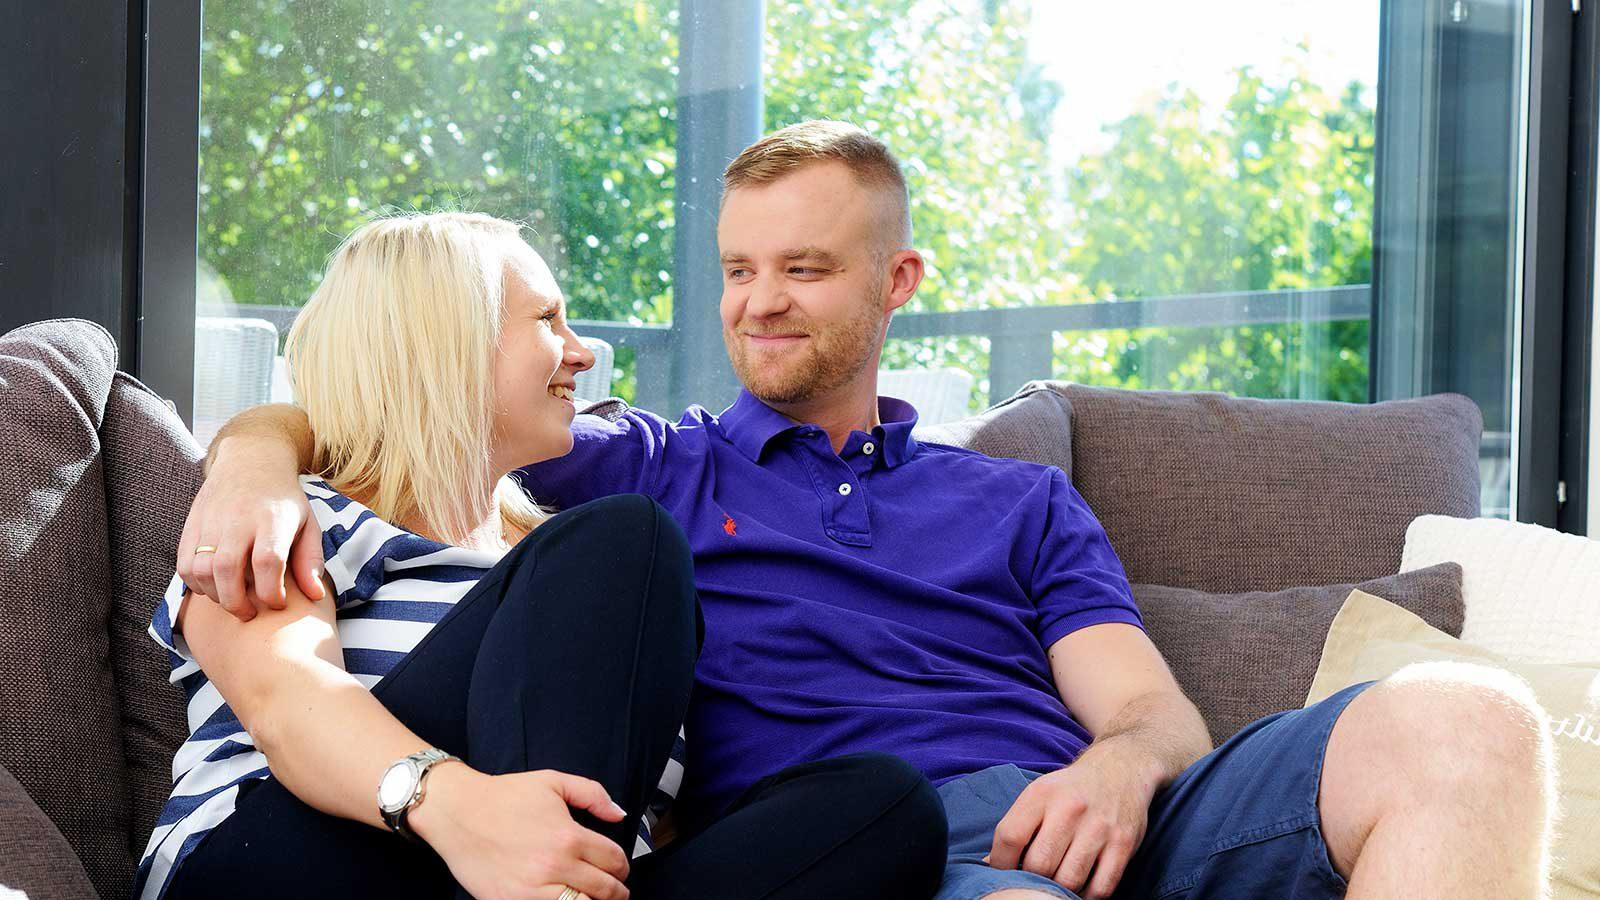 Paras ensimmäiset linjat online dating